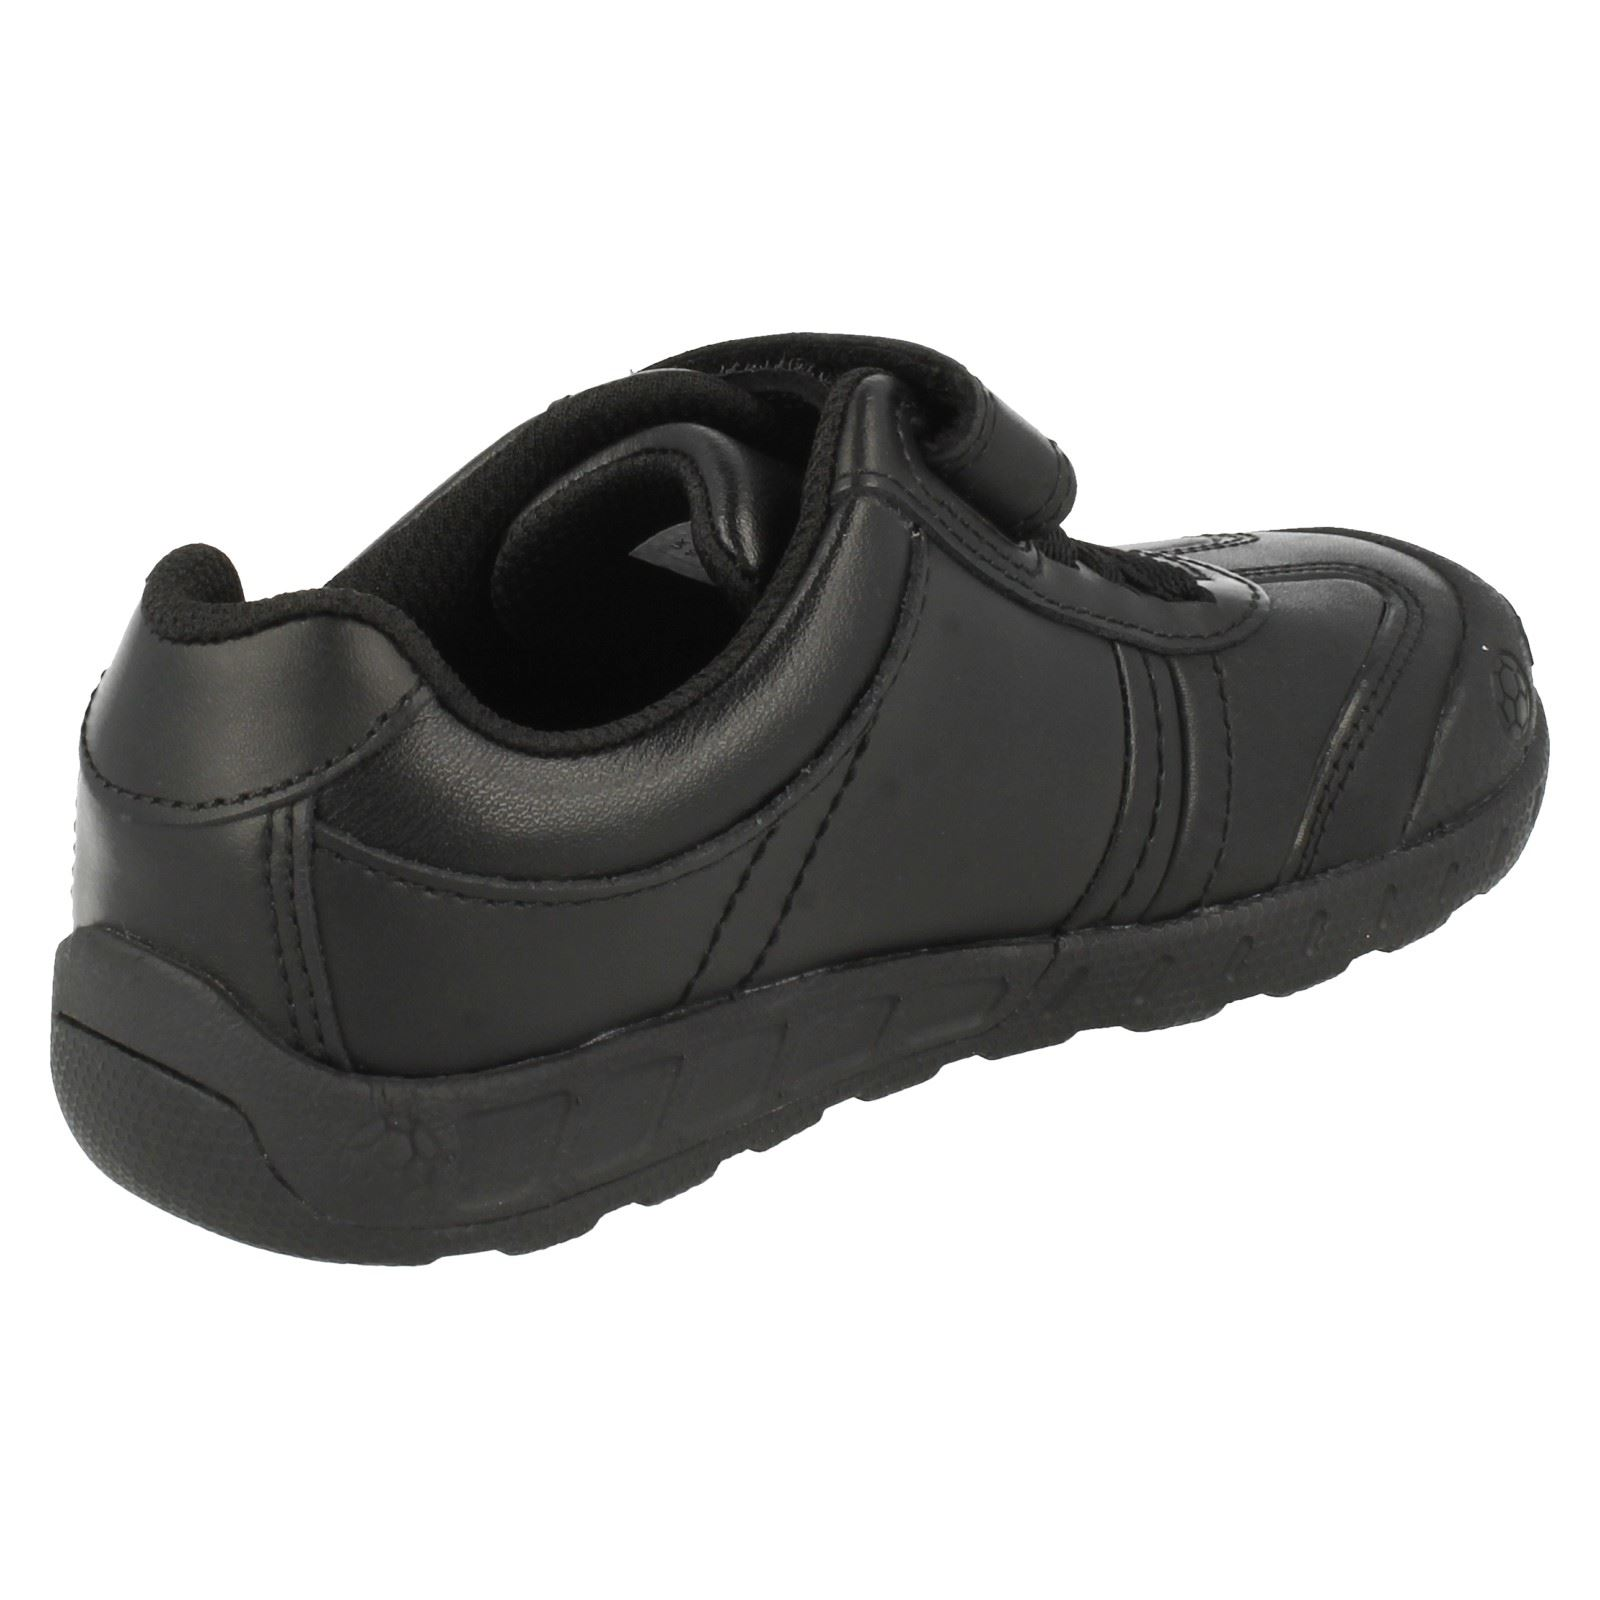 Chicos Clarks Zapatos Escolares líder Play